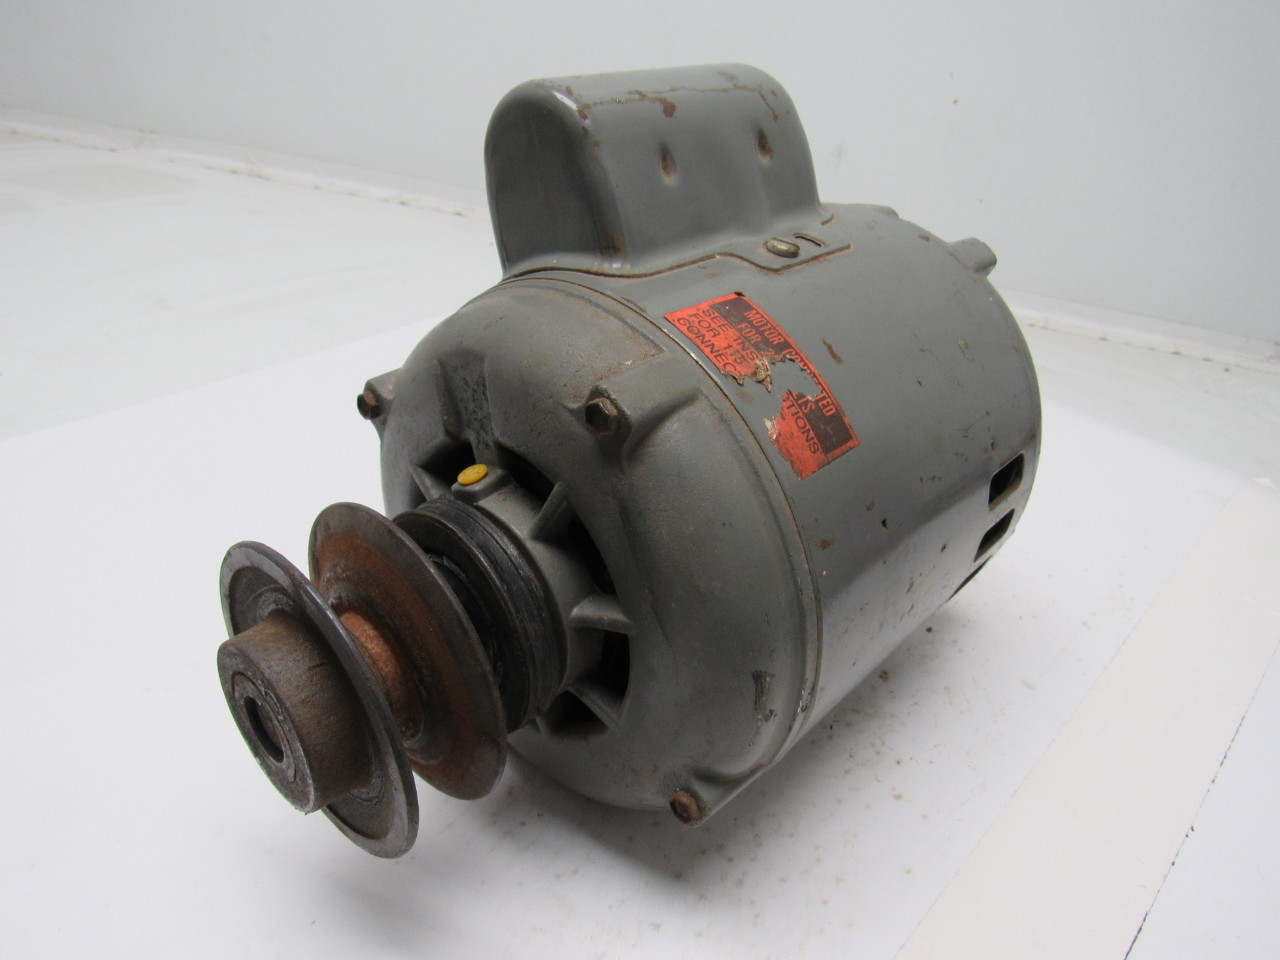 century 2 hp electric motor wiring diagram dayton 3 4 hp electric motor wiring dayton 5k458b 3/4 hp 1725 rpm electric motor | ebay